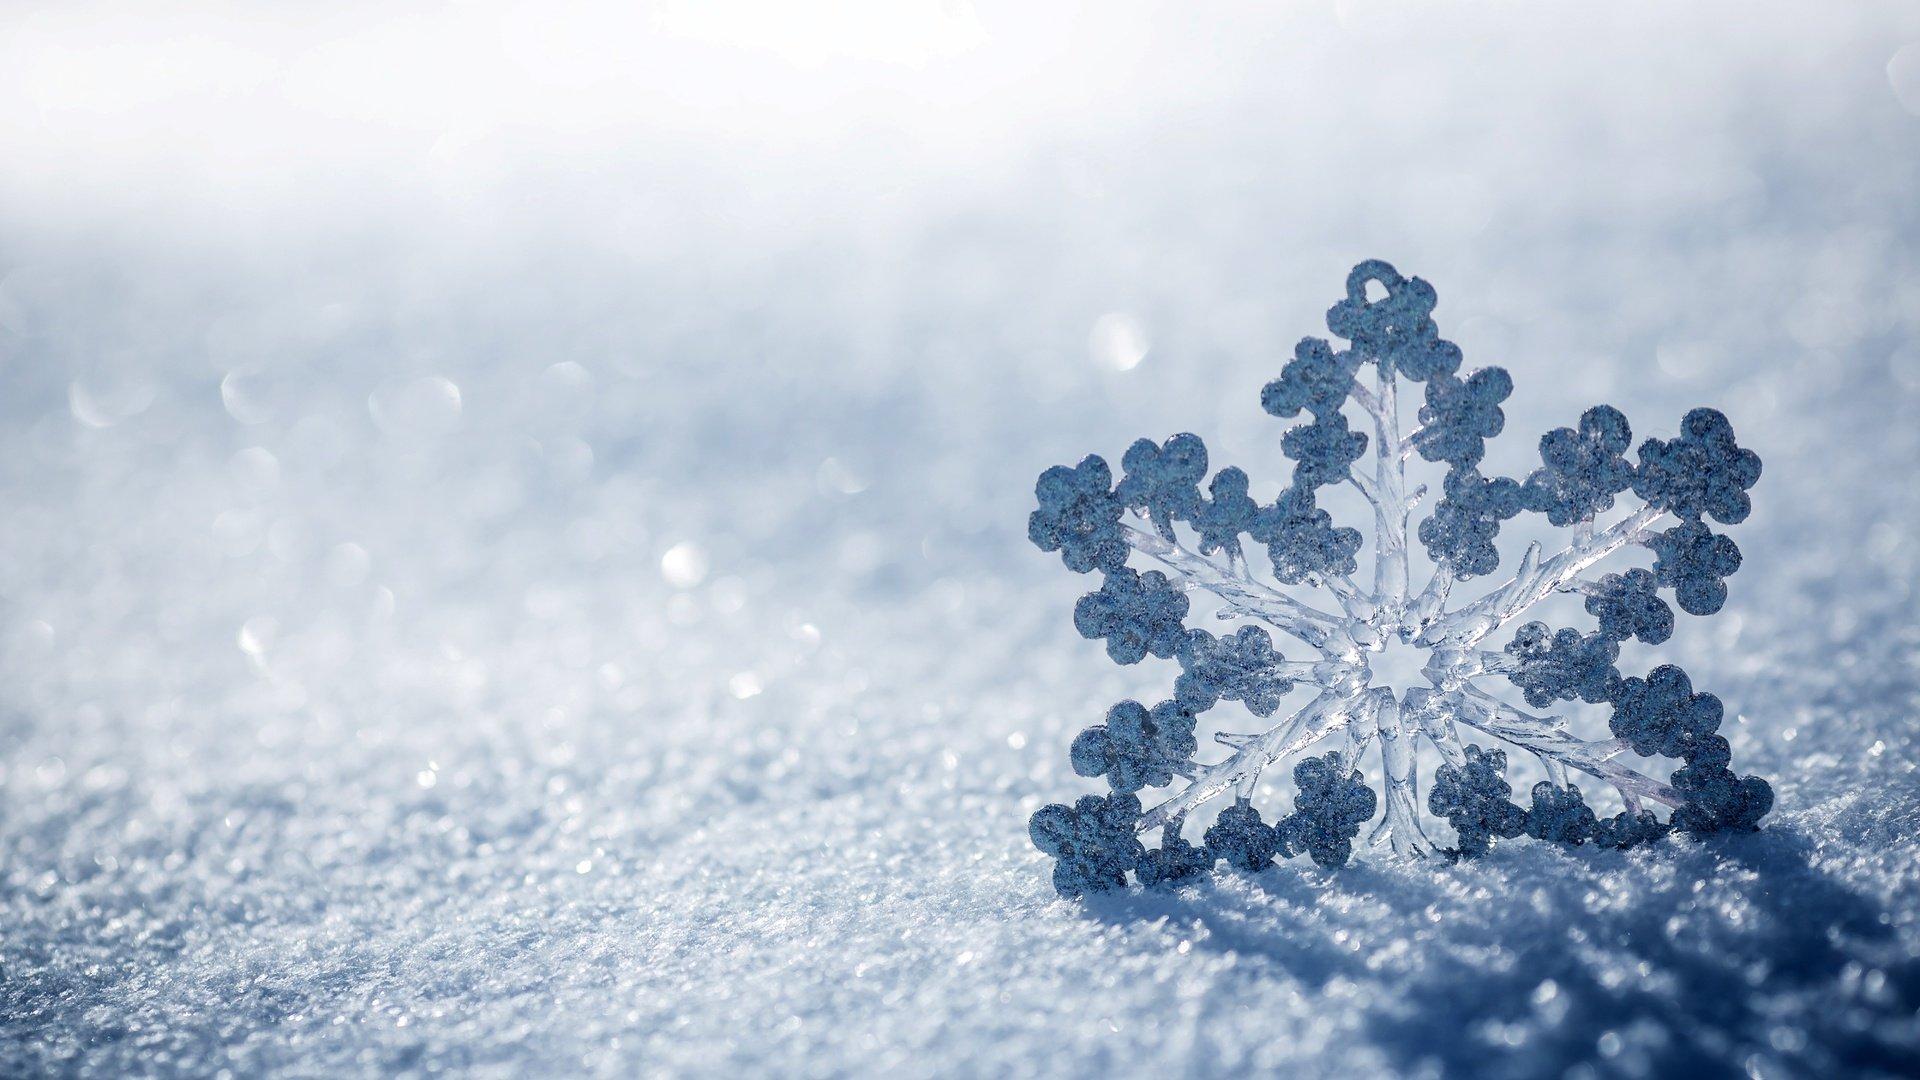 Beautiful Wallpaper Hd Snow Fall